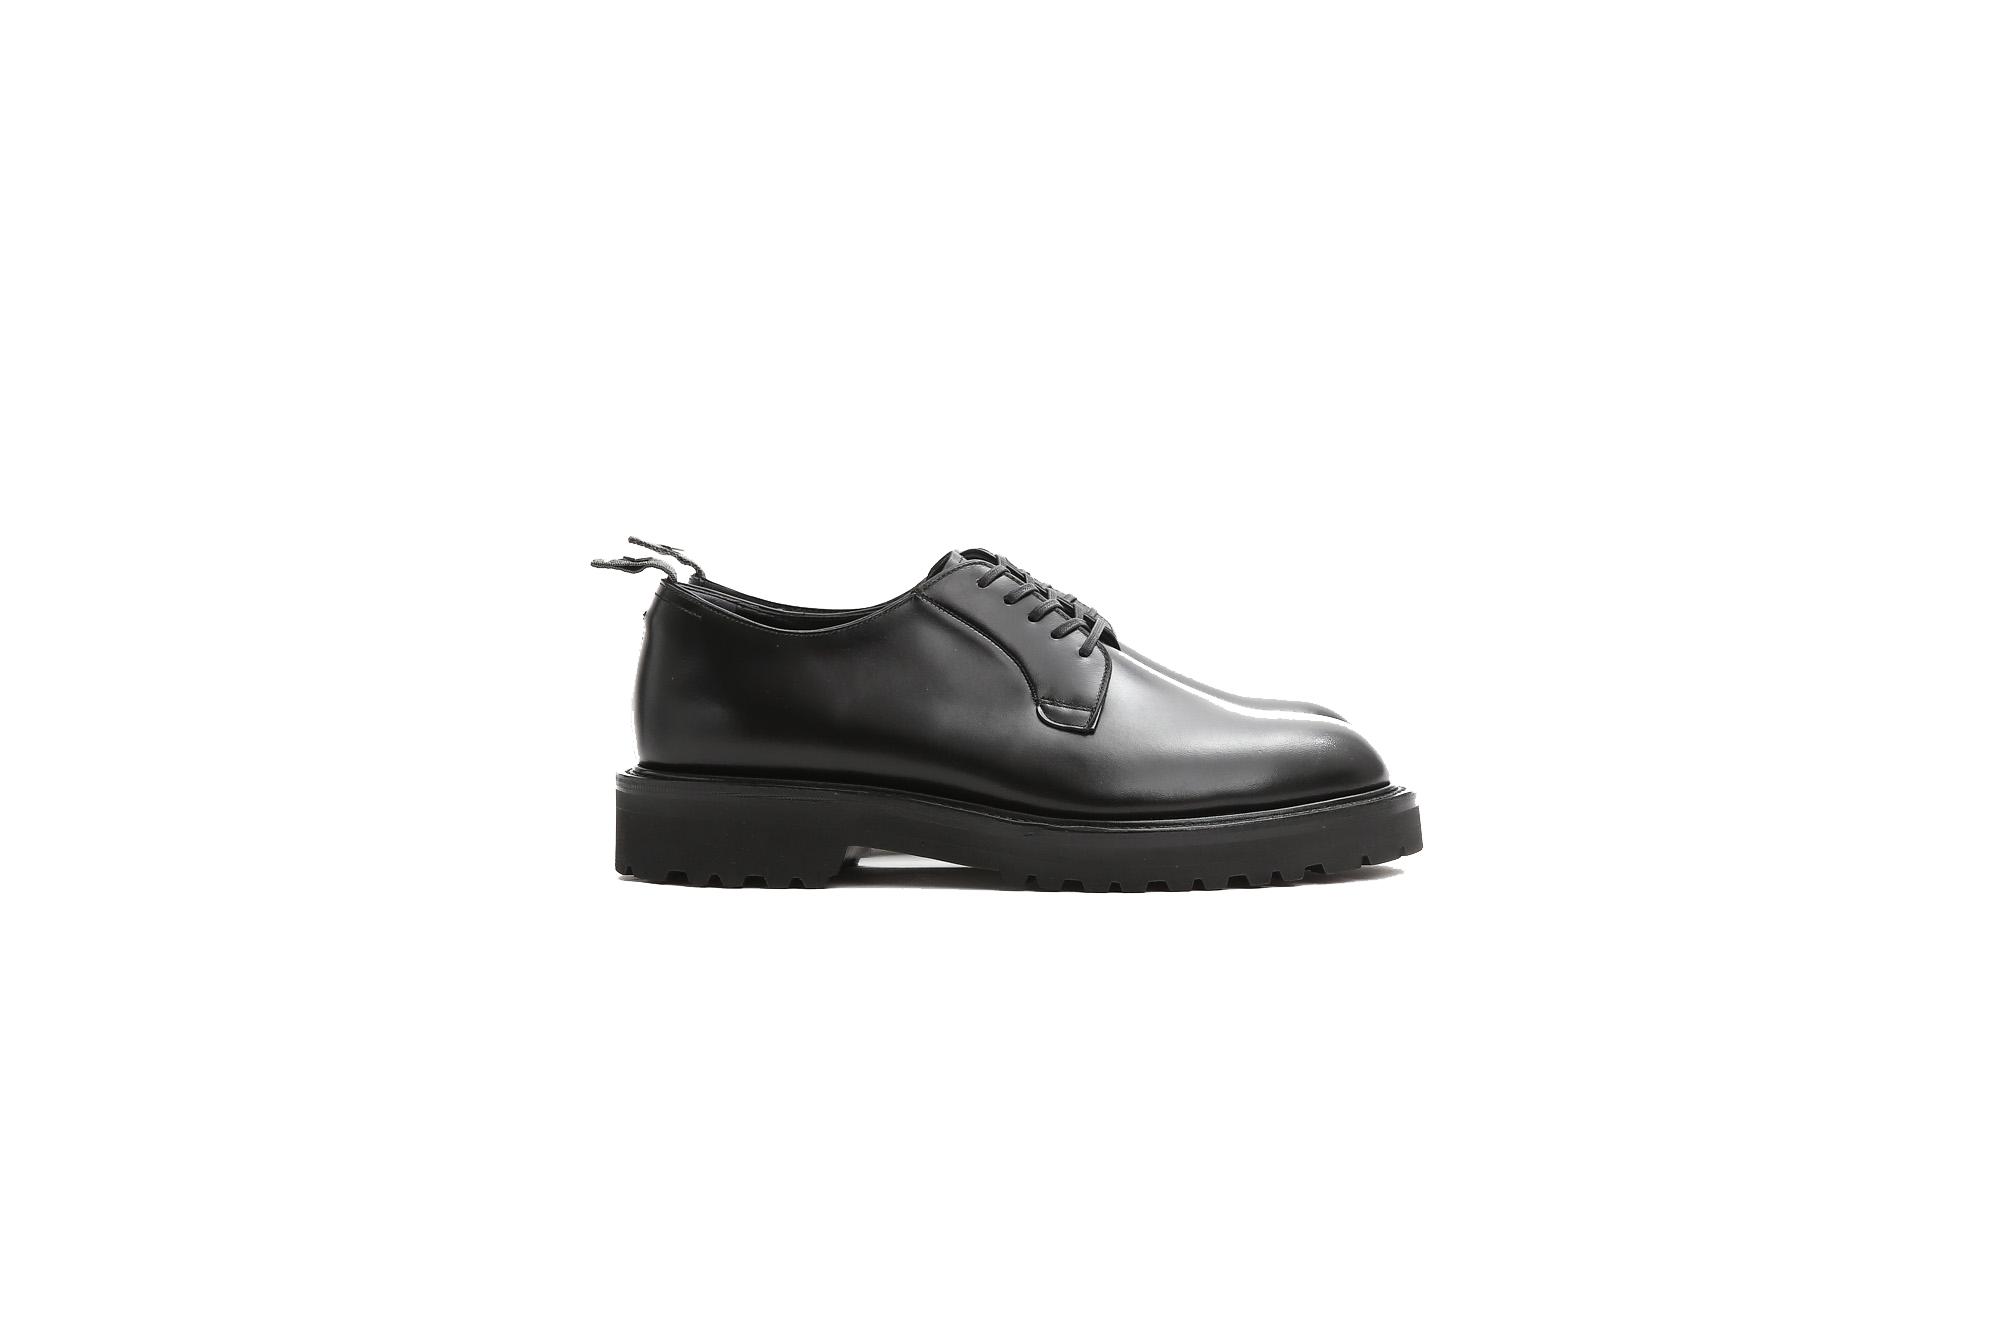 WH (ダブルエイチ) WHS-0010 Plane Toe Shoes (干場氏 スペシャル) Birdie Last (バーディラスト) ANNONAY Vocalou Calf Leather プレーントゥシューズ BLACK (ブラック) MADE IN JAPAN (日本製) 2019 秋冬【9月中旬入荷分】【ご予約受付開始】愛知 名古屋 alto e diritto altoediritto アルトエデリット